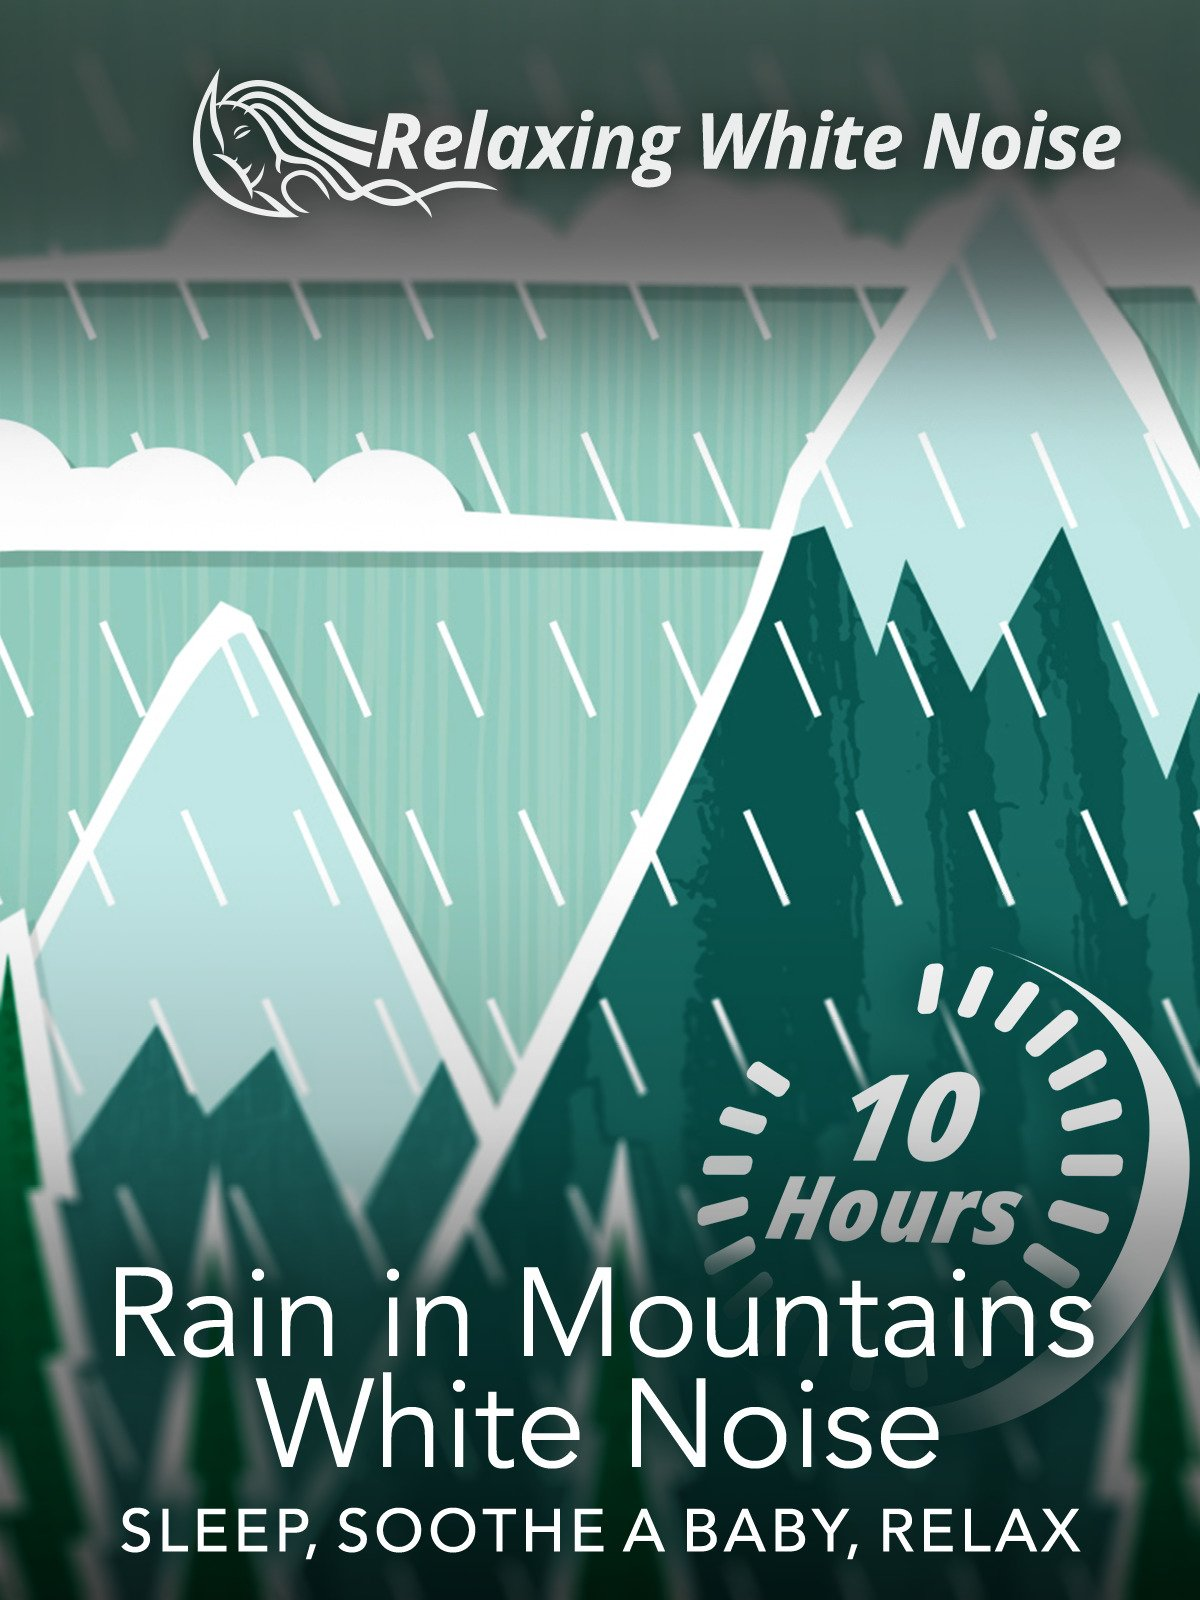 Rain in Mountains White Noise 10 Hours